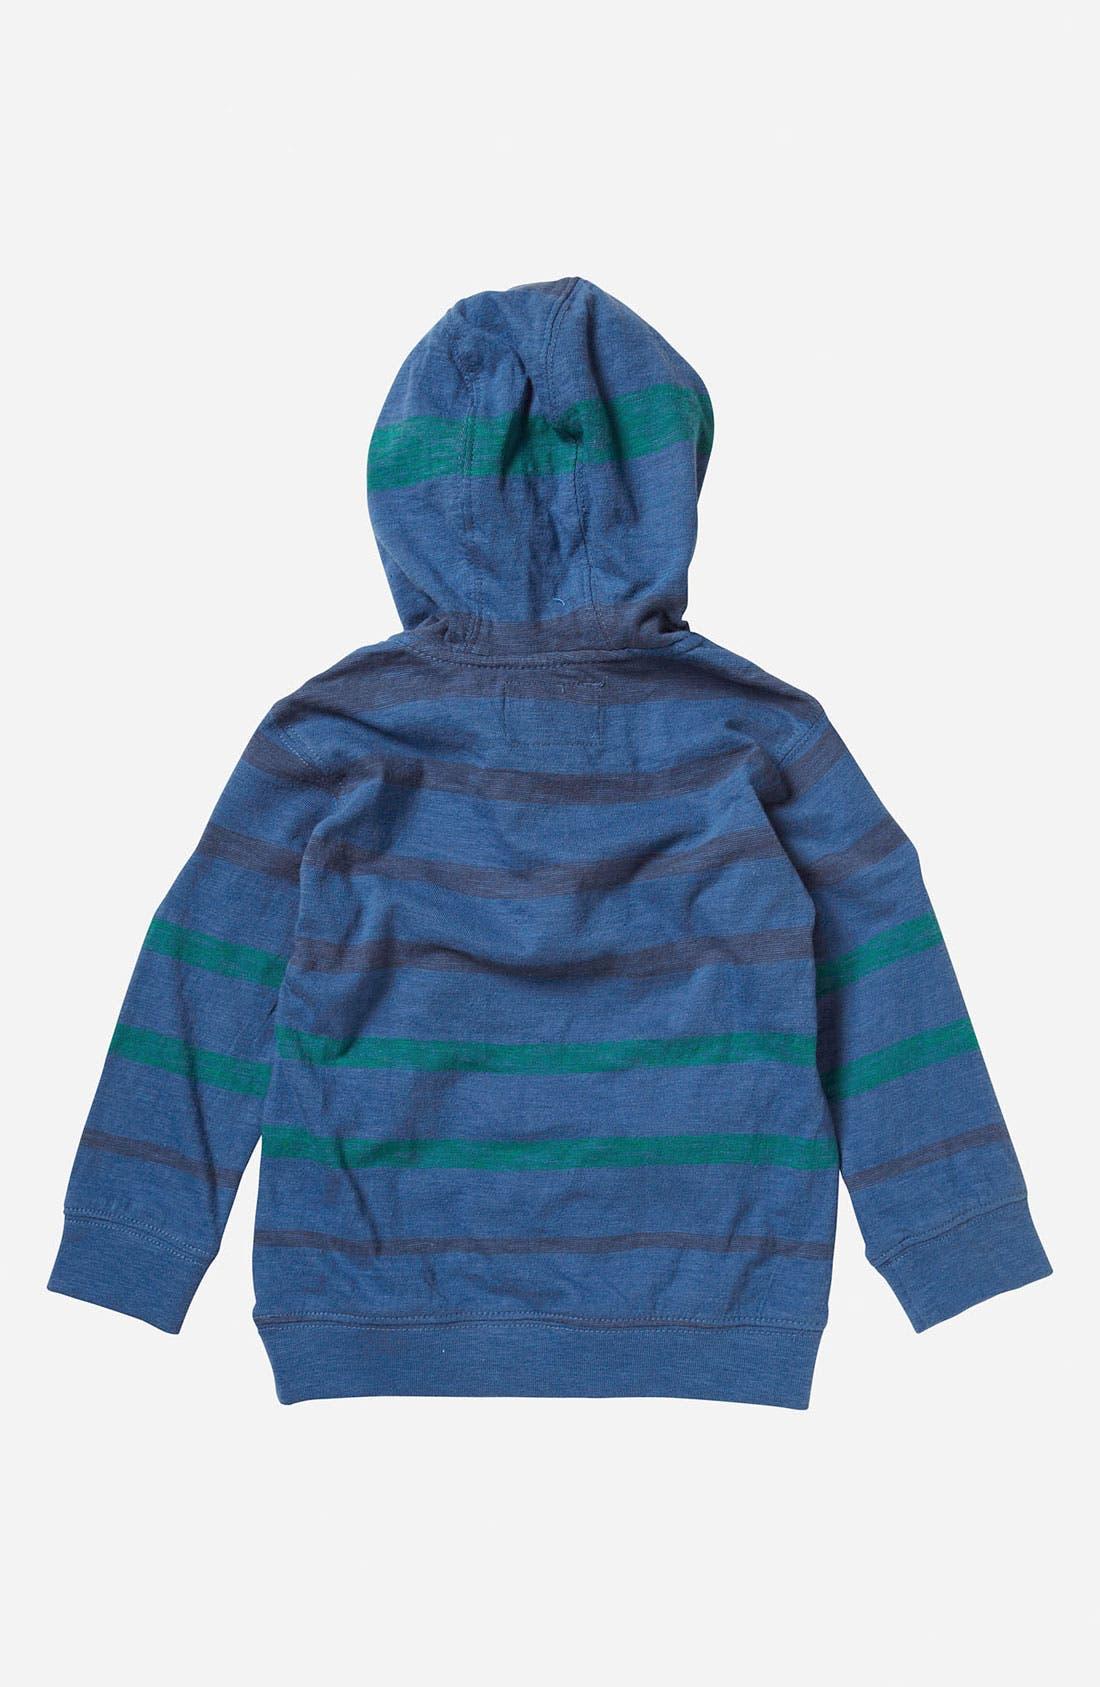 Alternate Image 2  - Quiksilver 'Merz' Hooded Henley Top (Infant)